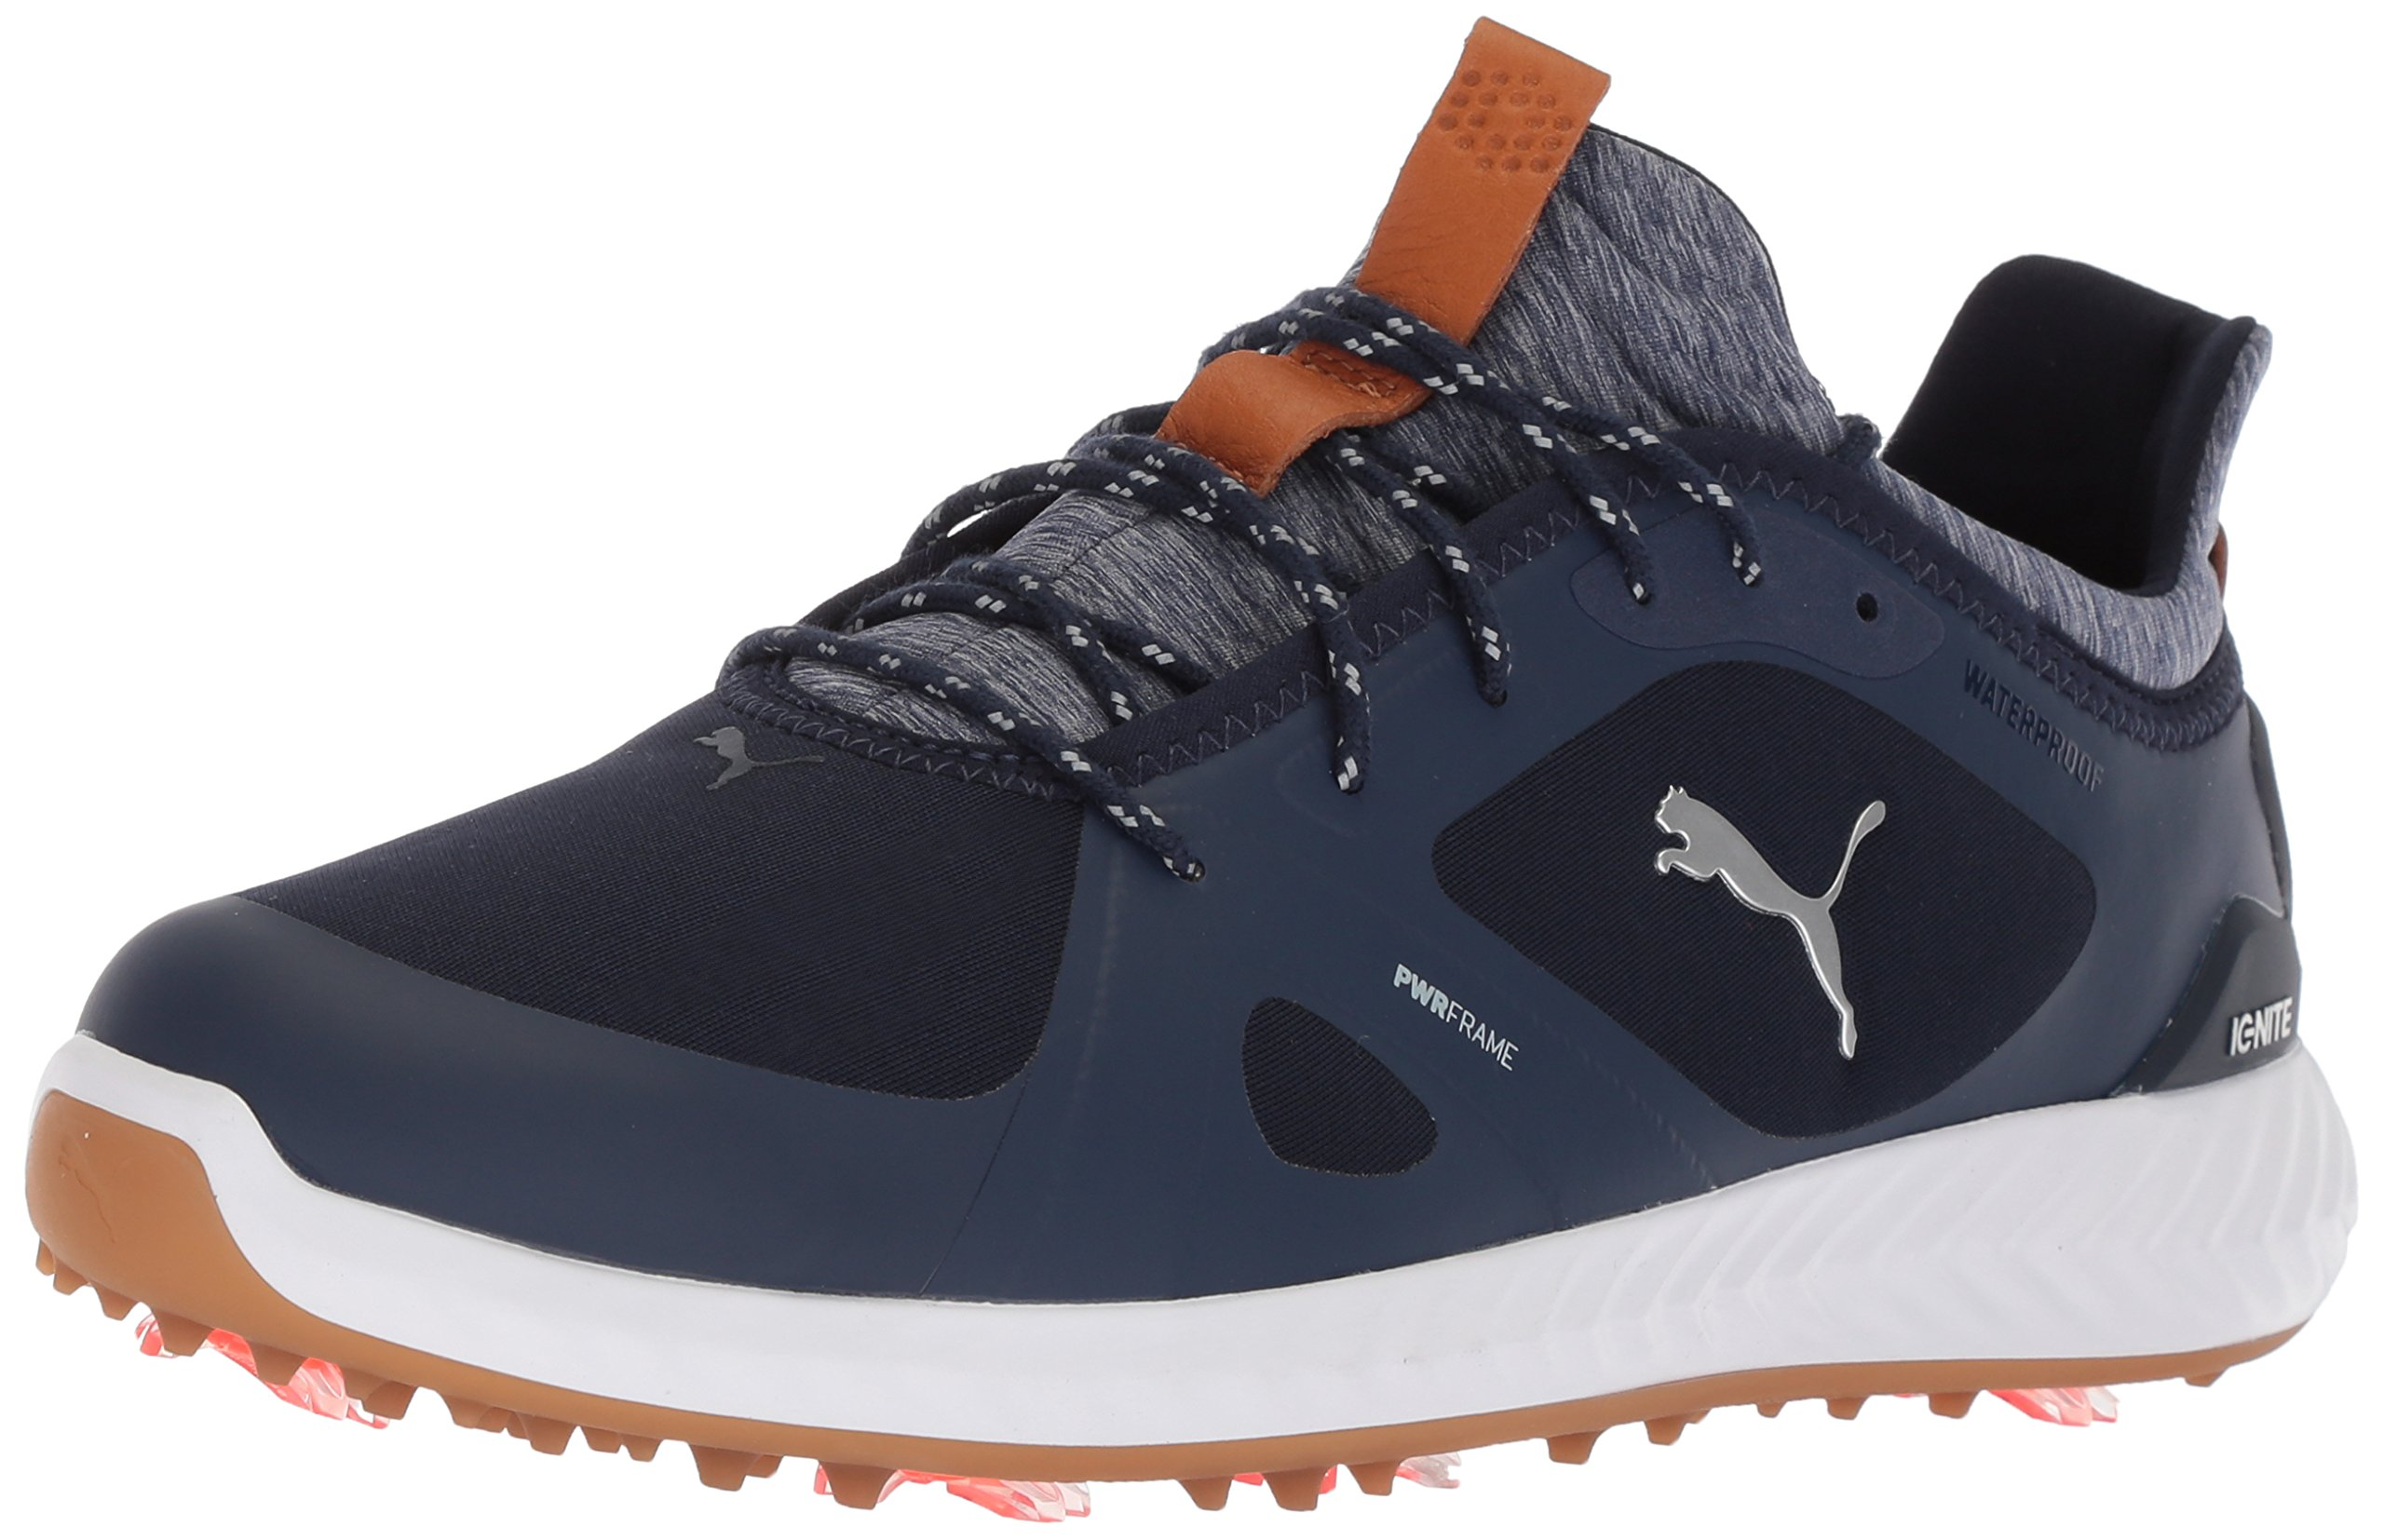 PUMA Golf Men's Ignite Pwradapt Golf Shoe Peacoat/White, 10.5 Medium US by PUMA